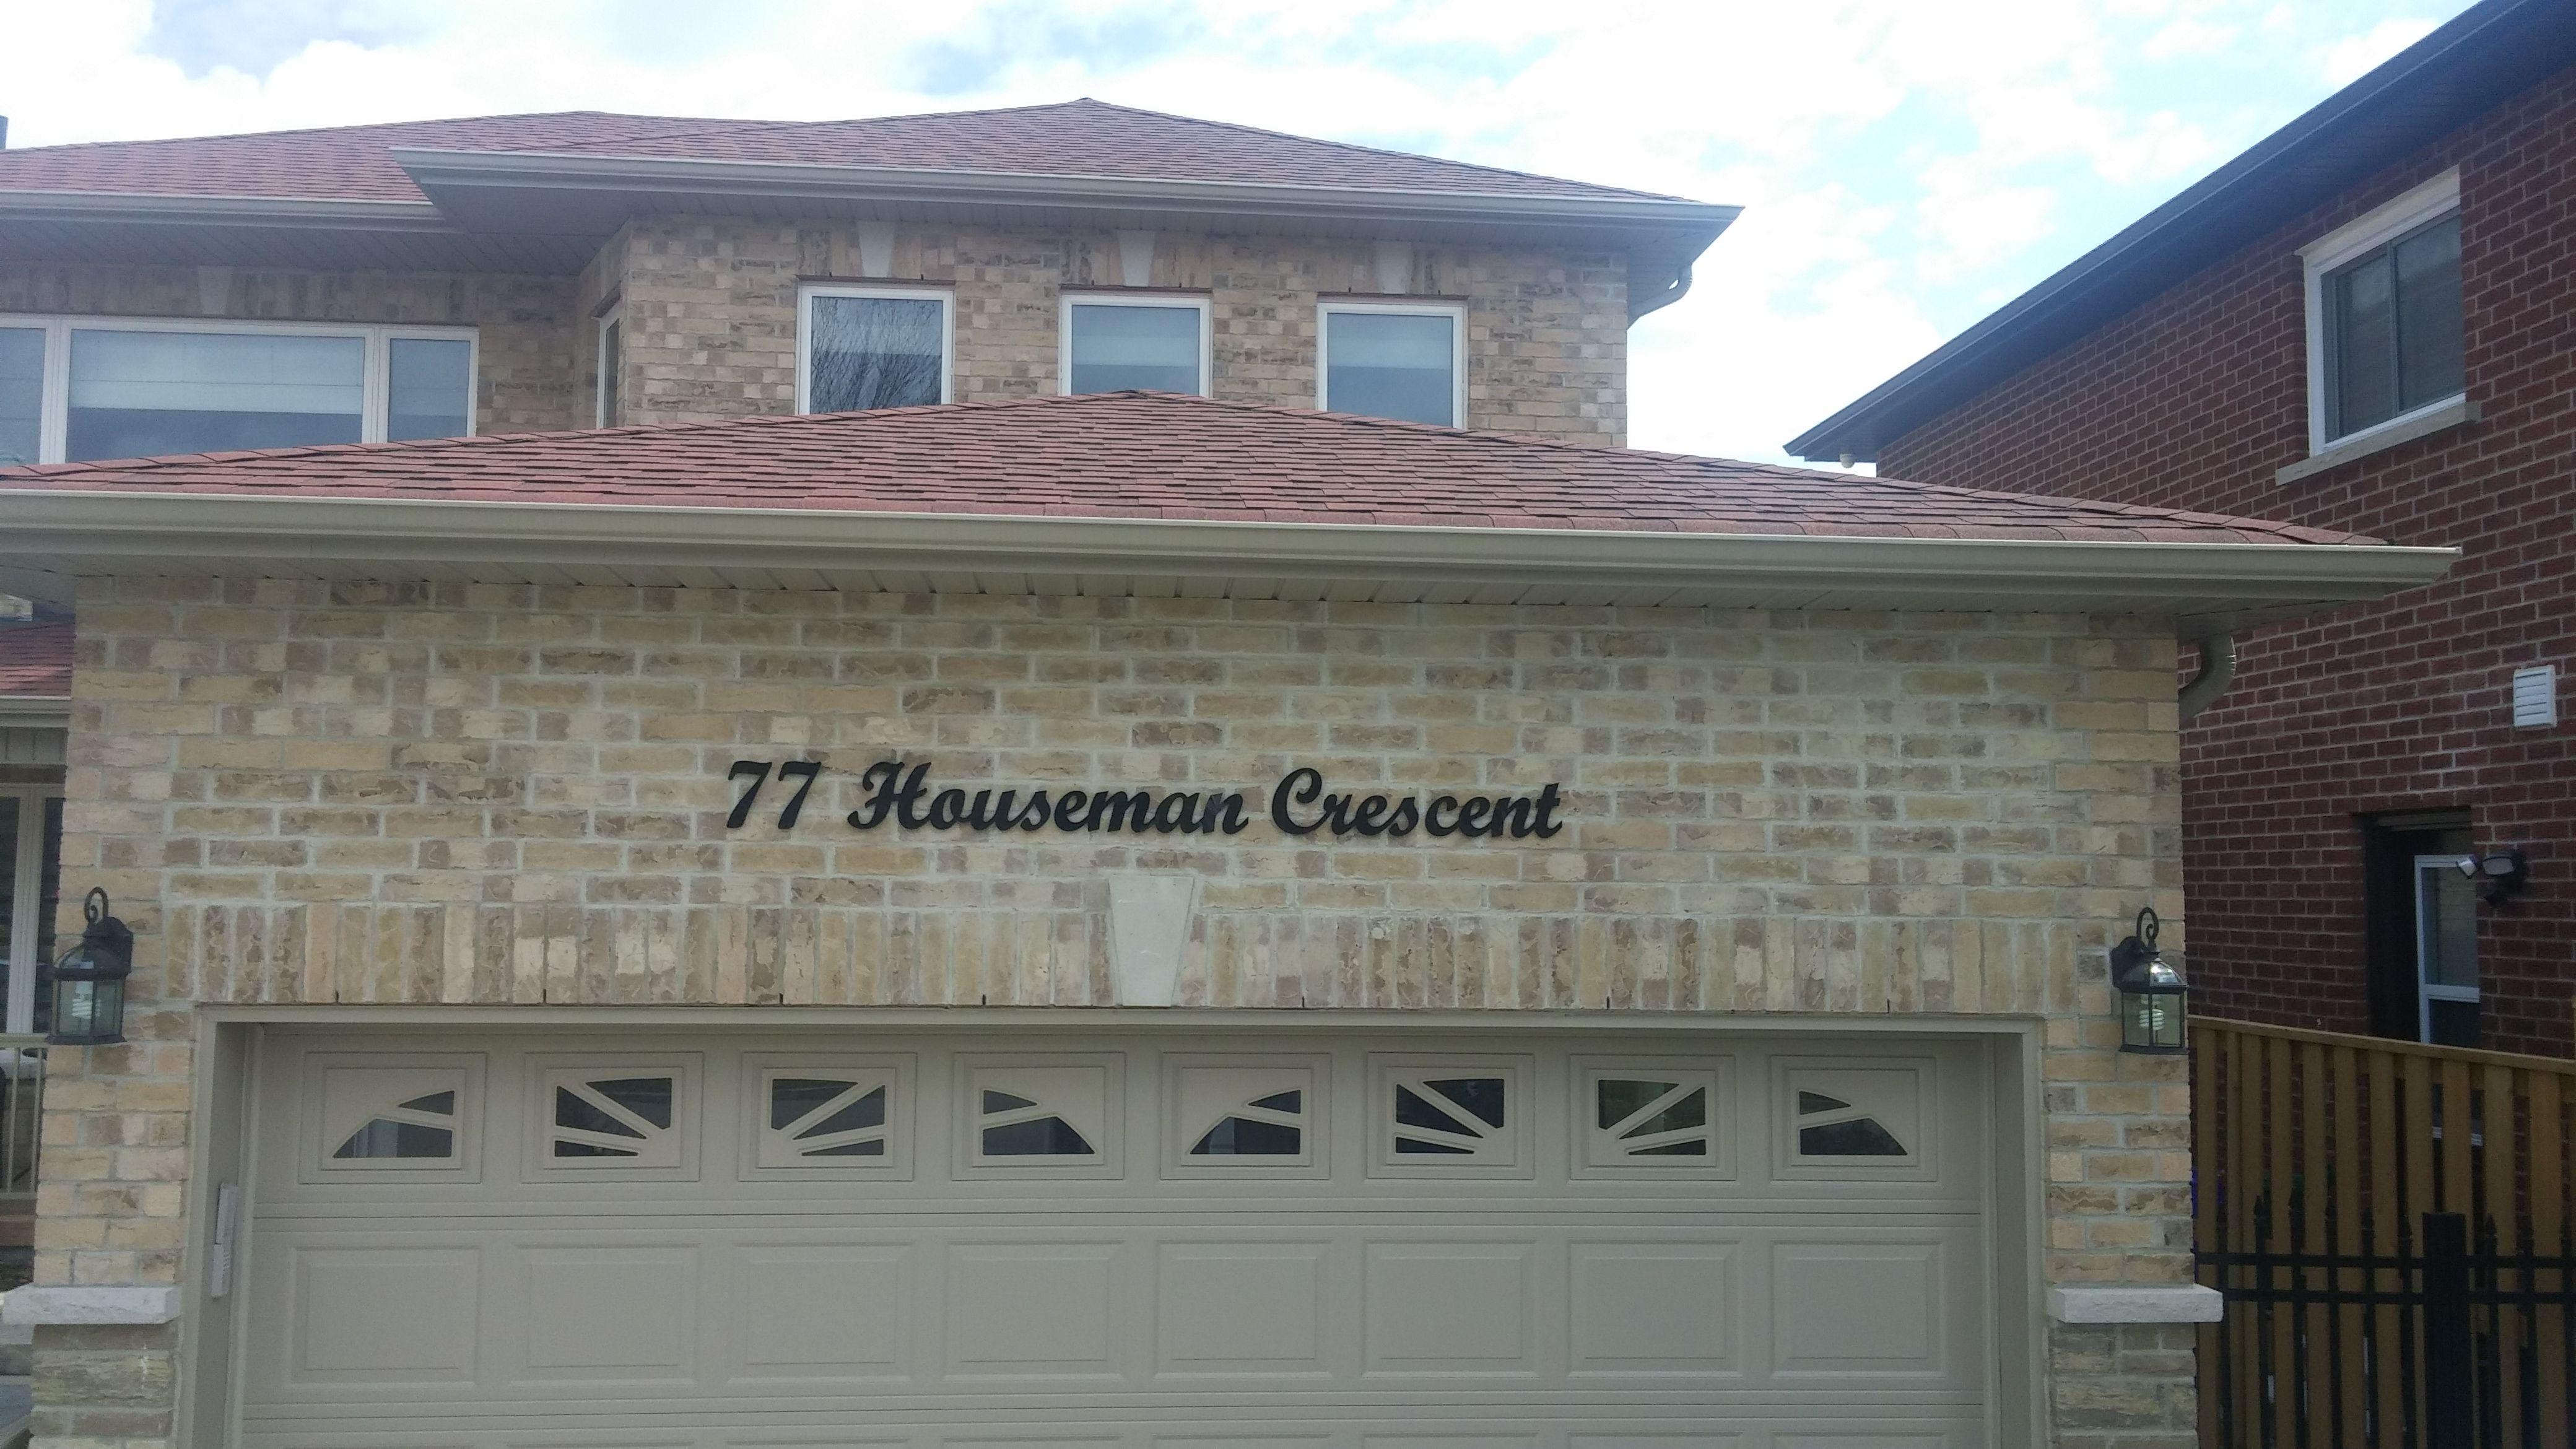 77 Houseman Crescent House Address Cutout Black Acrylic Characters Script House Letters Price 180 Set House Letters House Address House Numbers